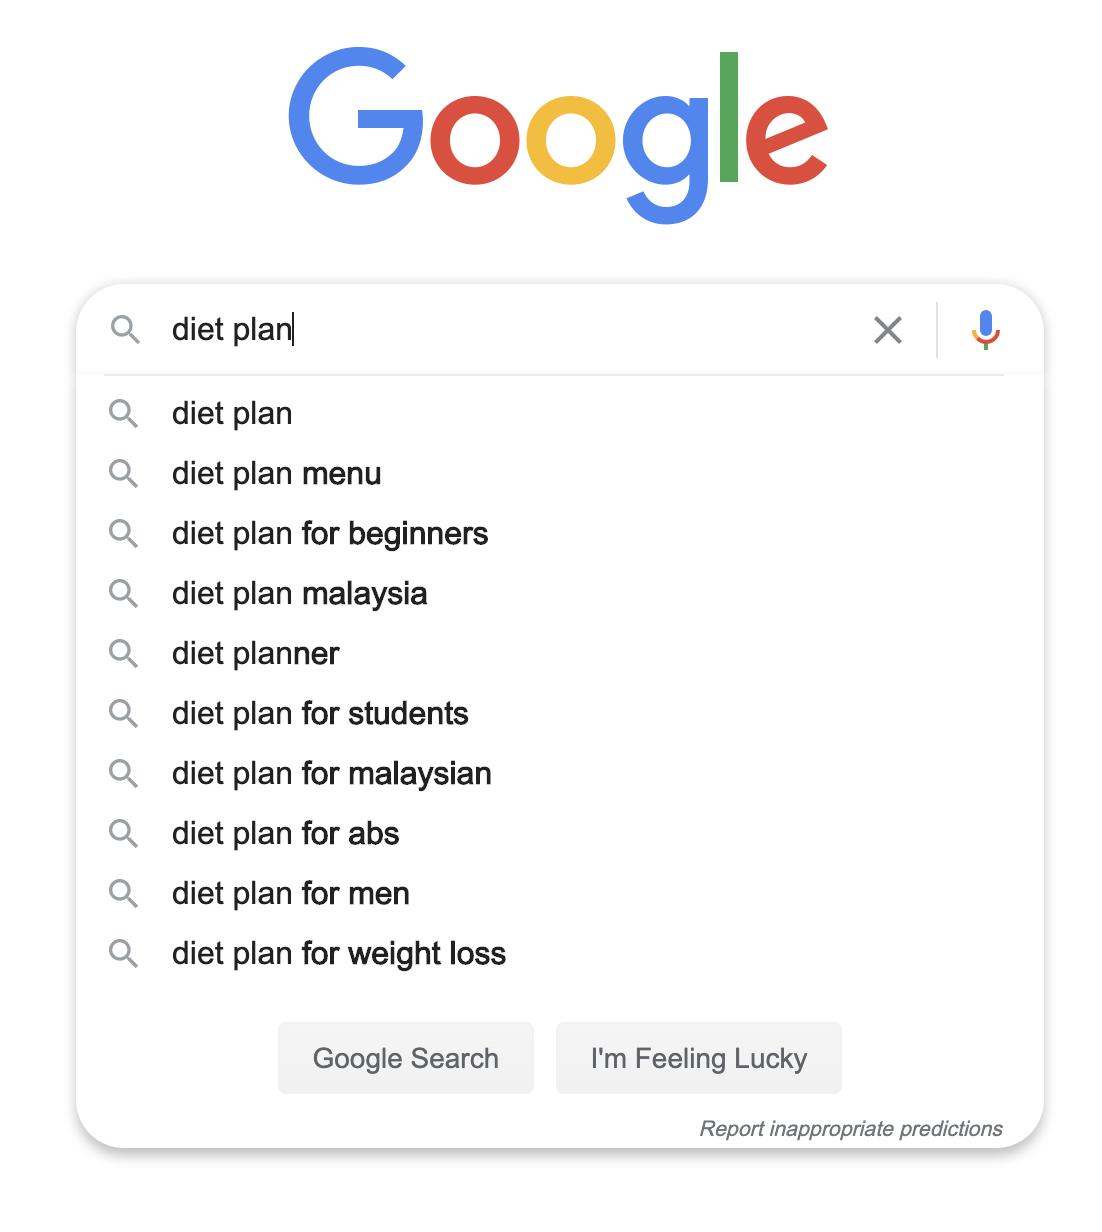 diet-plan-seo